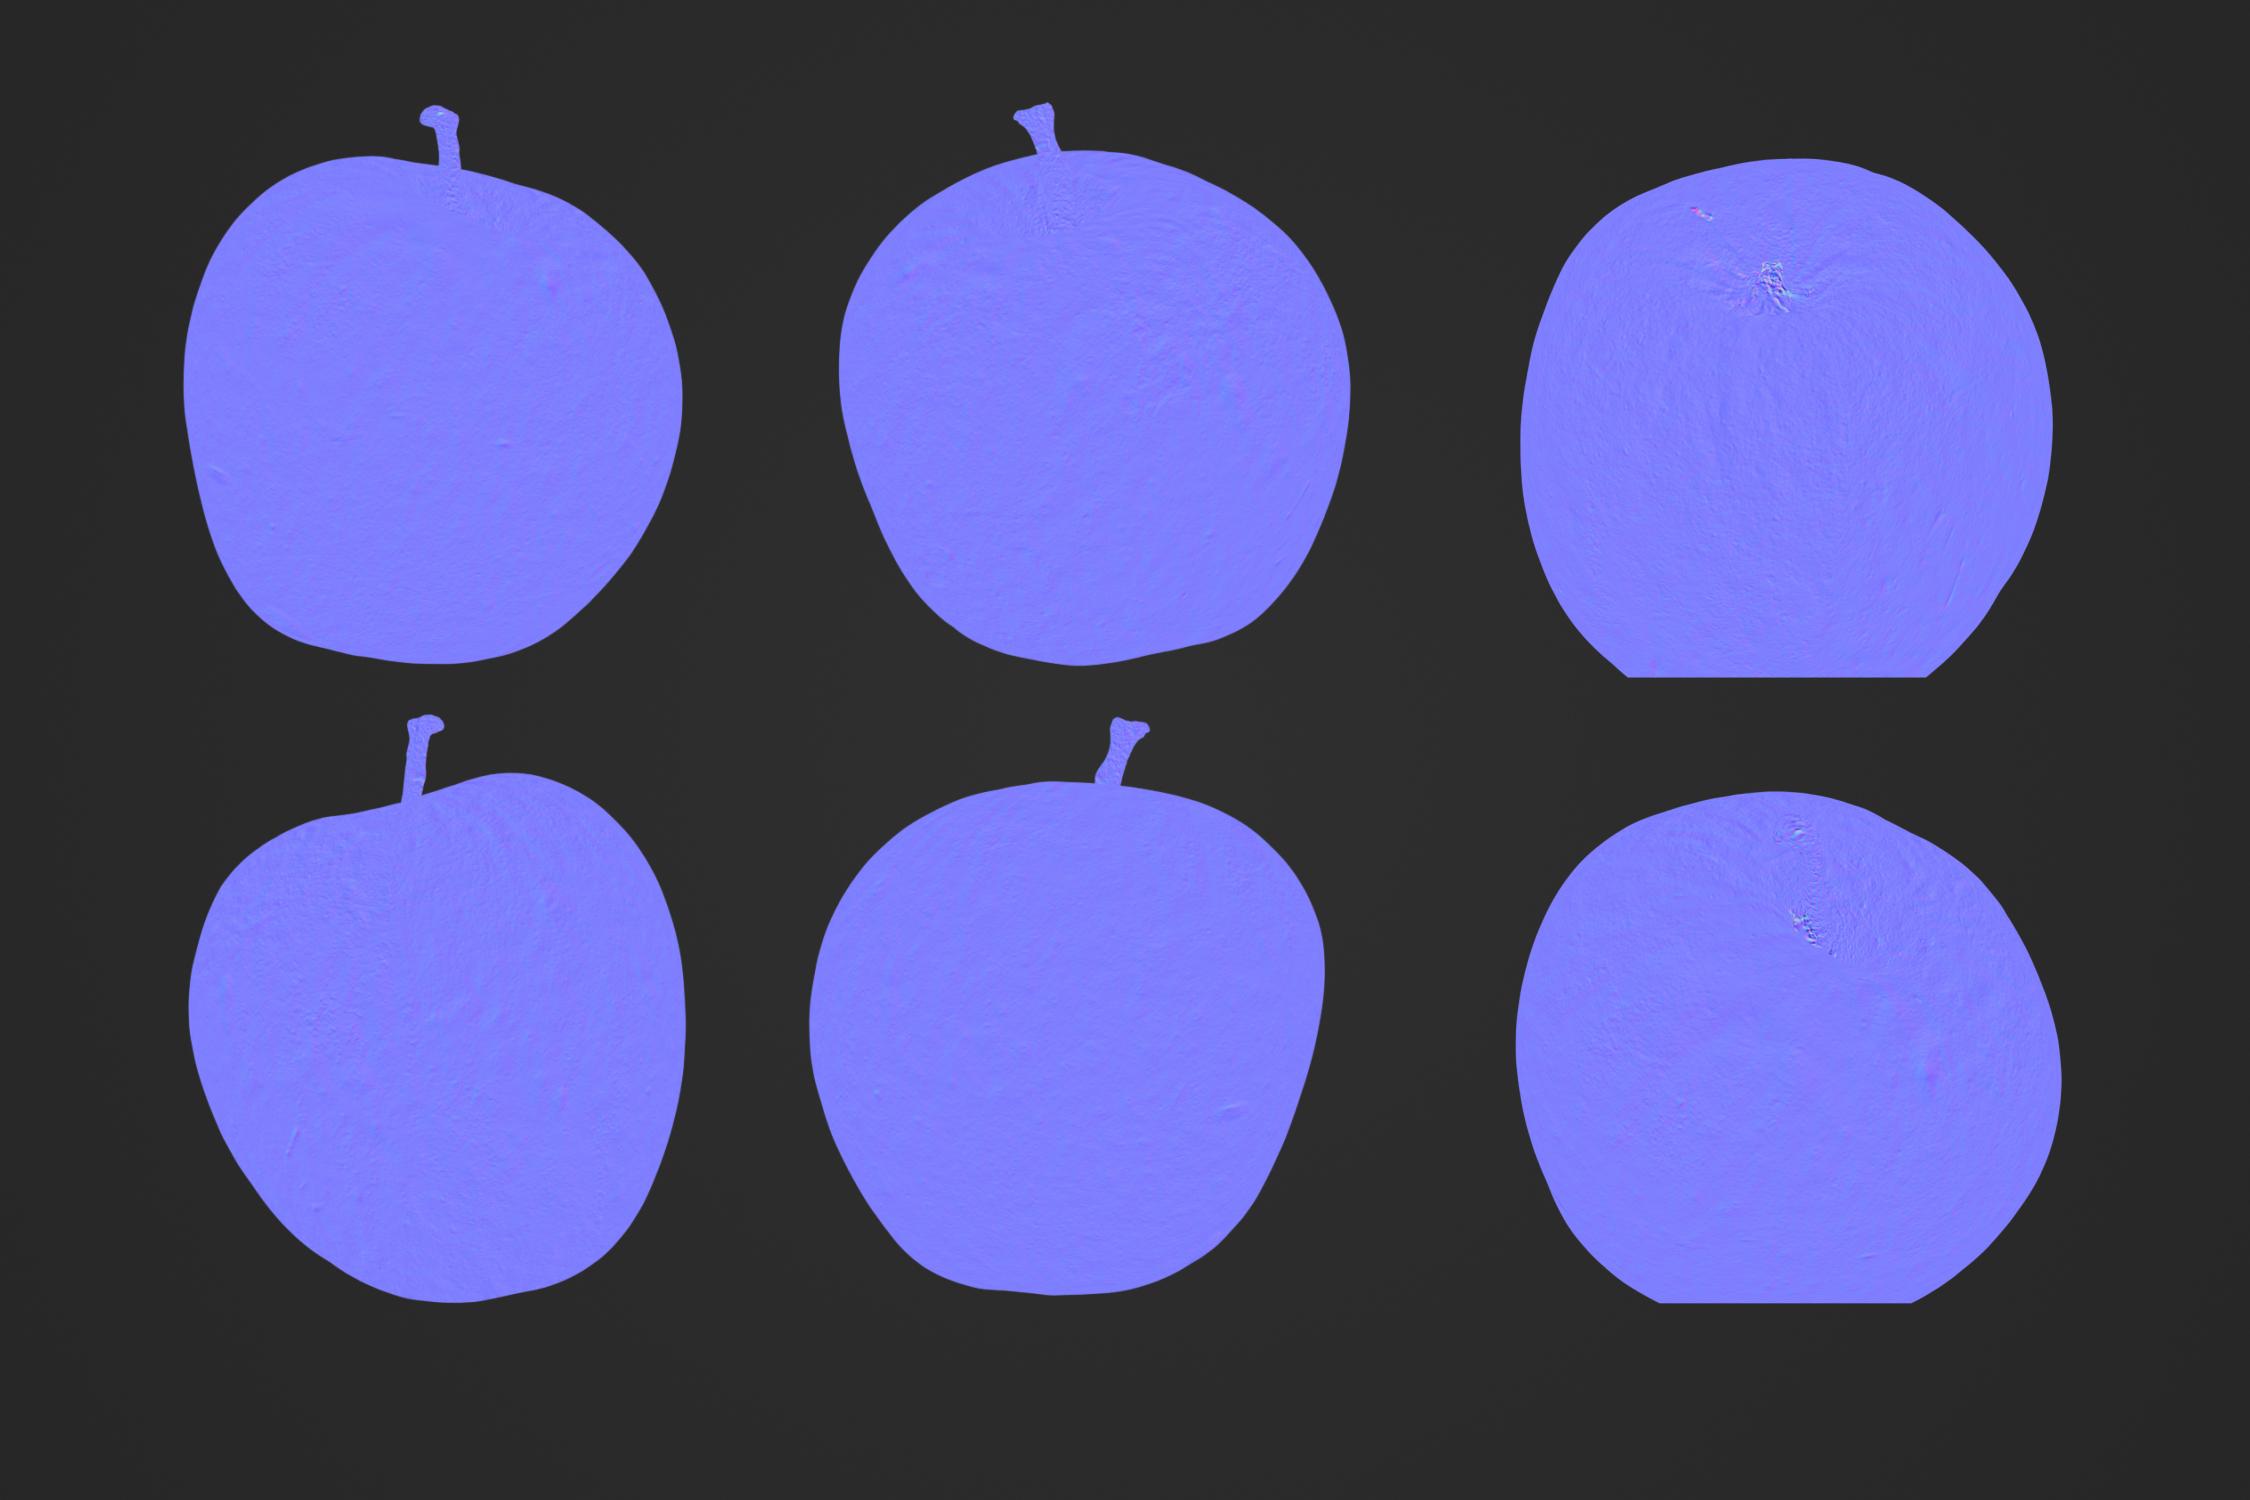 Apple_3_3.jpg